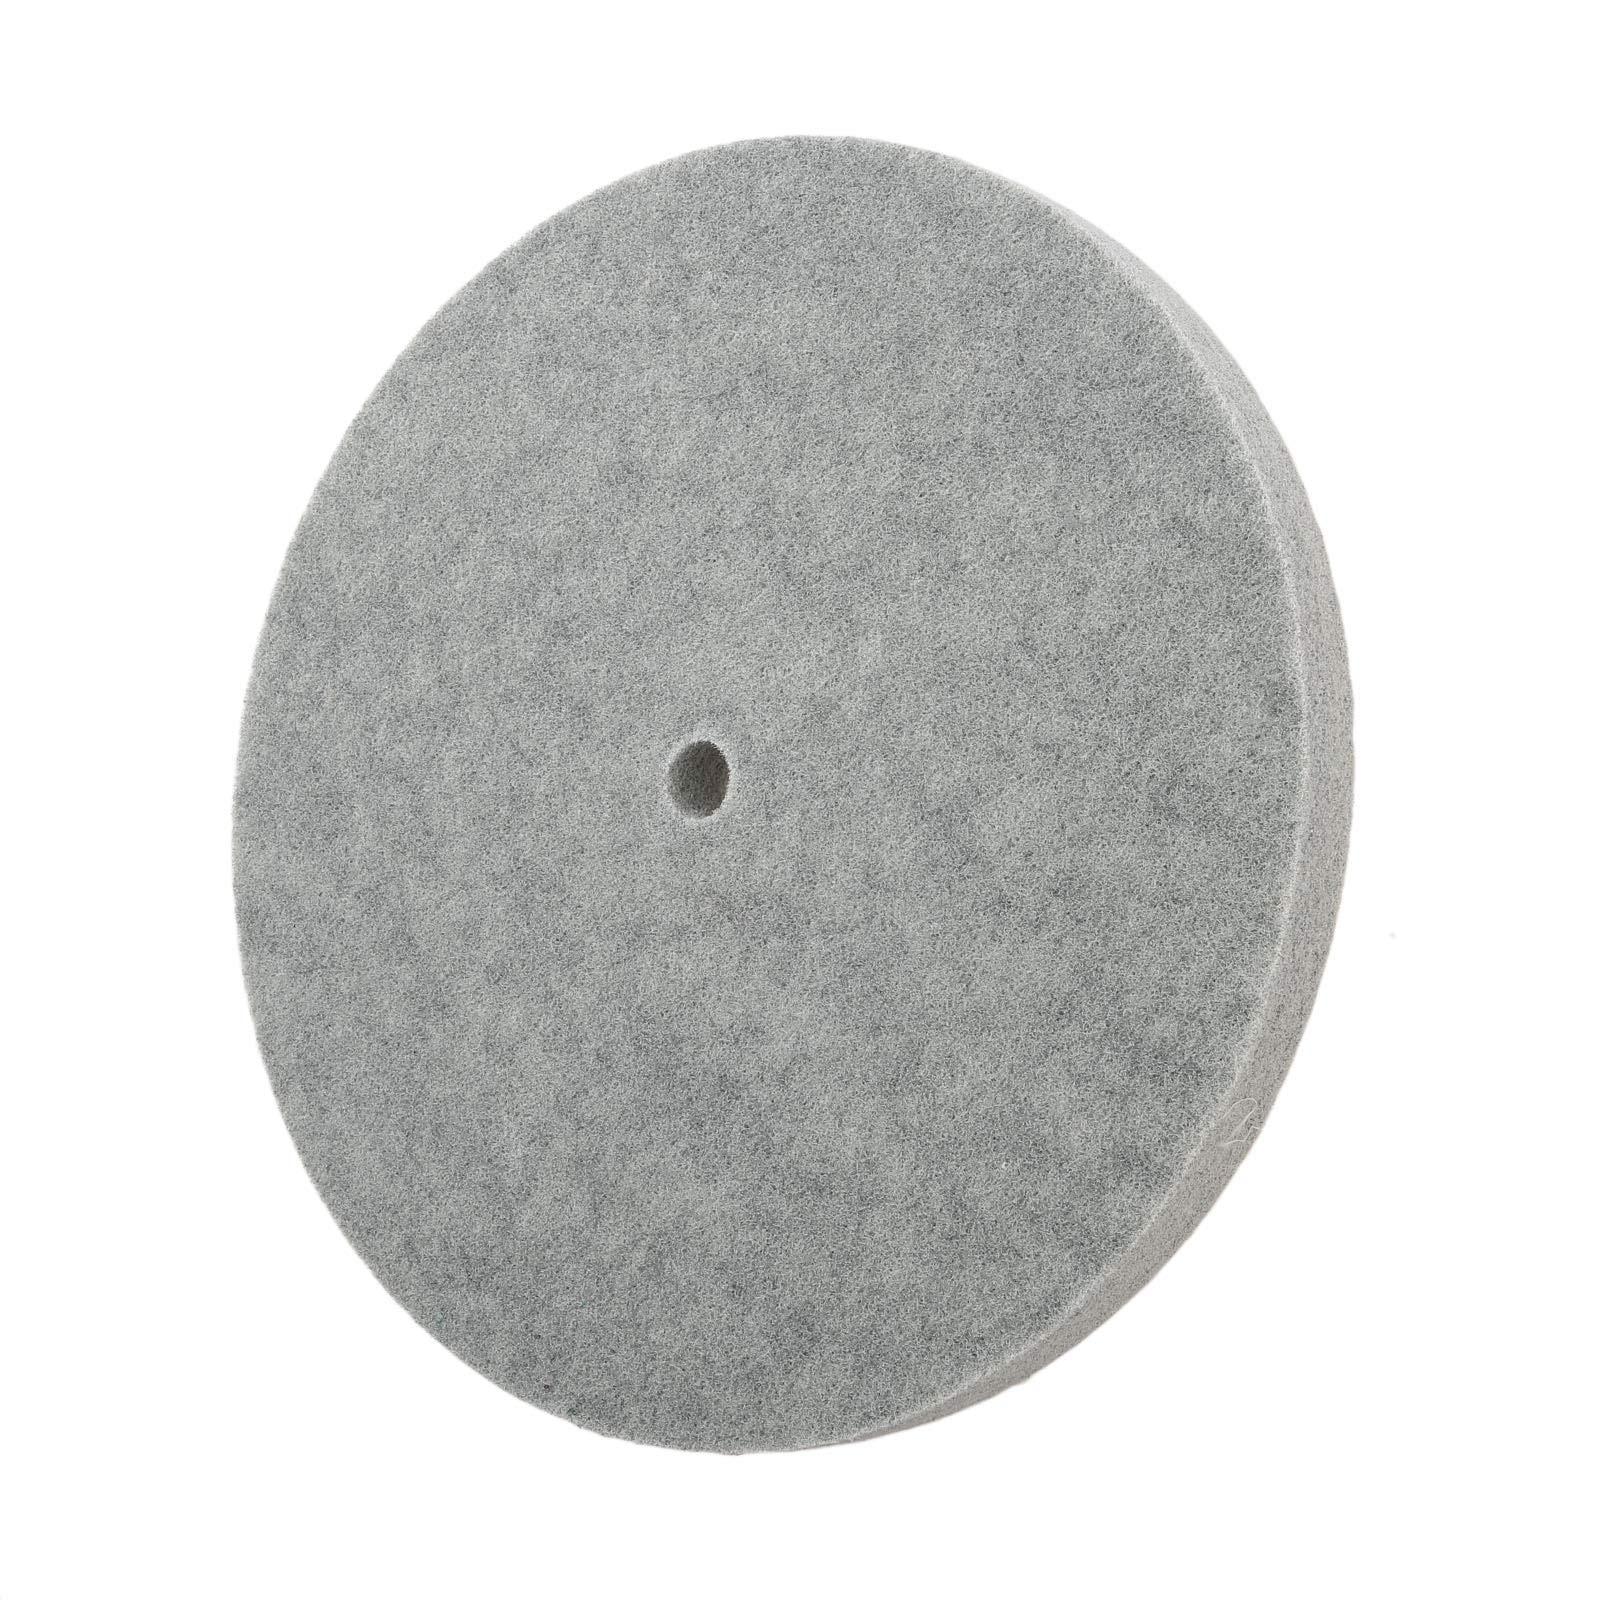 1 PC Thickness Nylon Fiber Polishing Wheel Non-Woven Unitized Wheel 5P 180#, 300MM by Yetaha (Image #3)